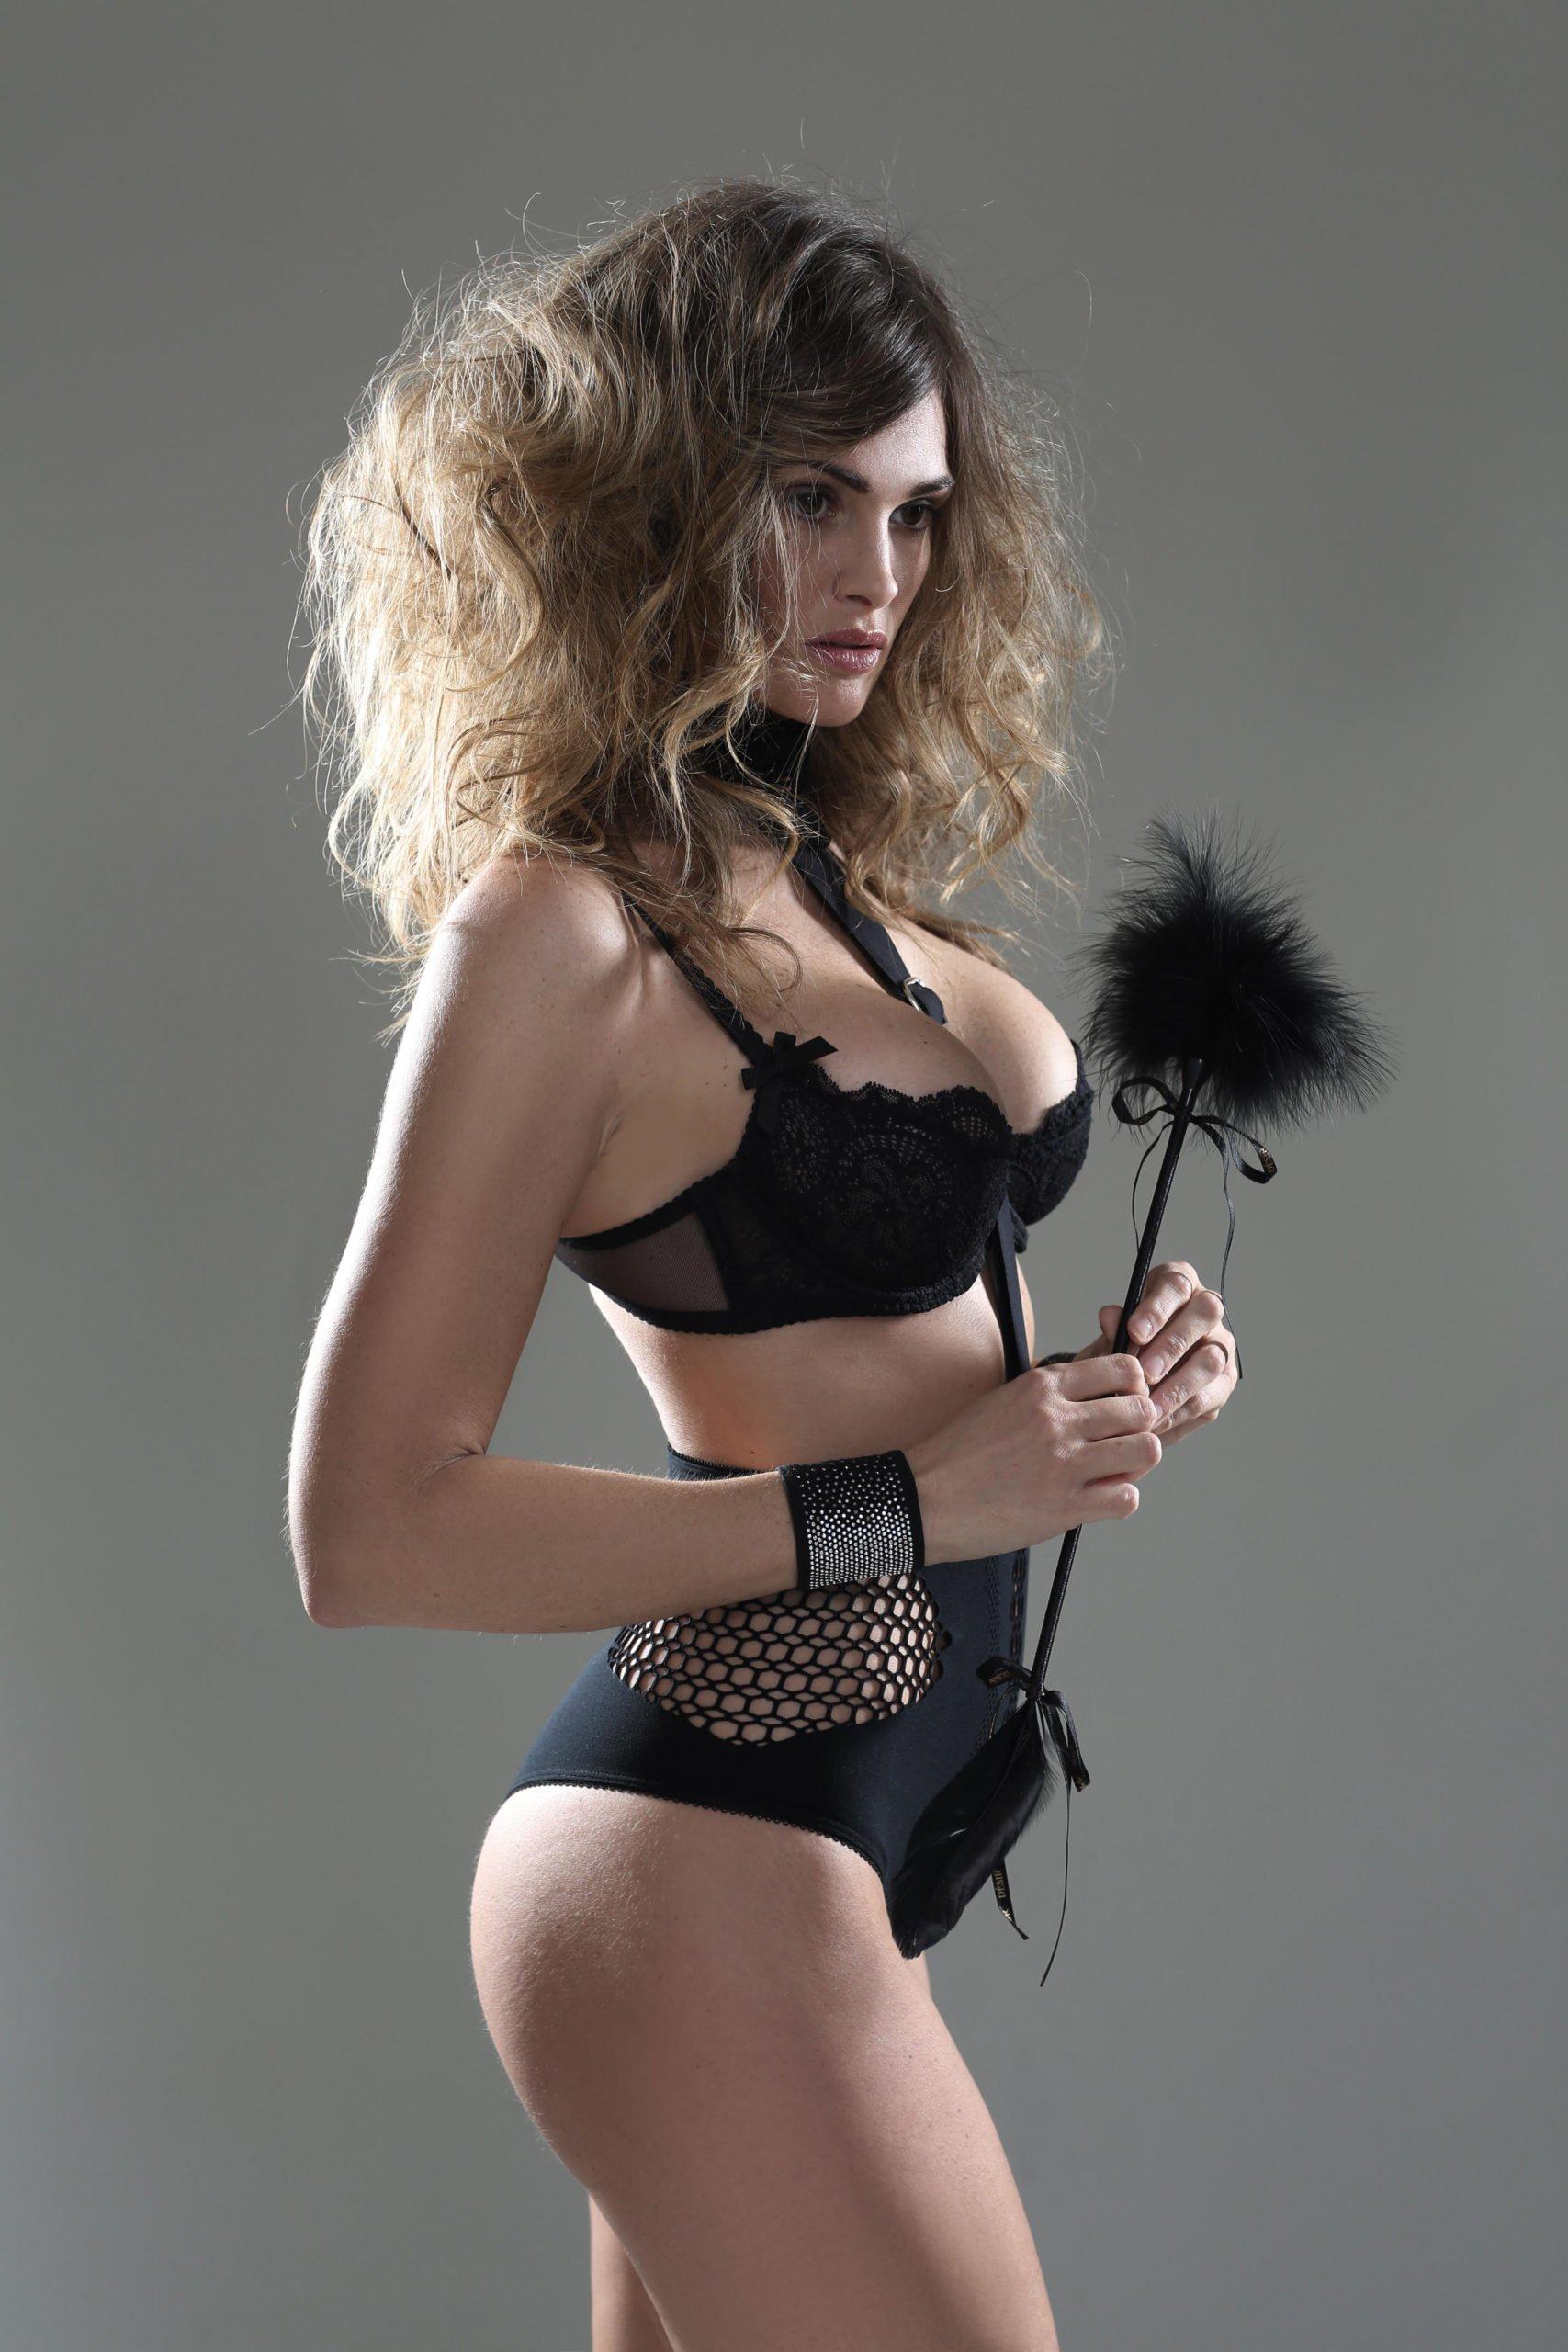 Brunette boudoir model in black bra history of boudoir photography by Caroline Malouf